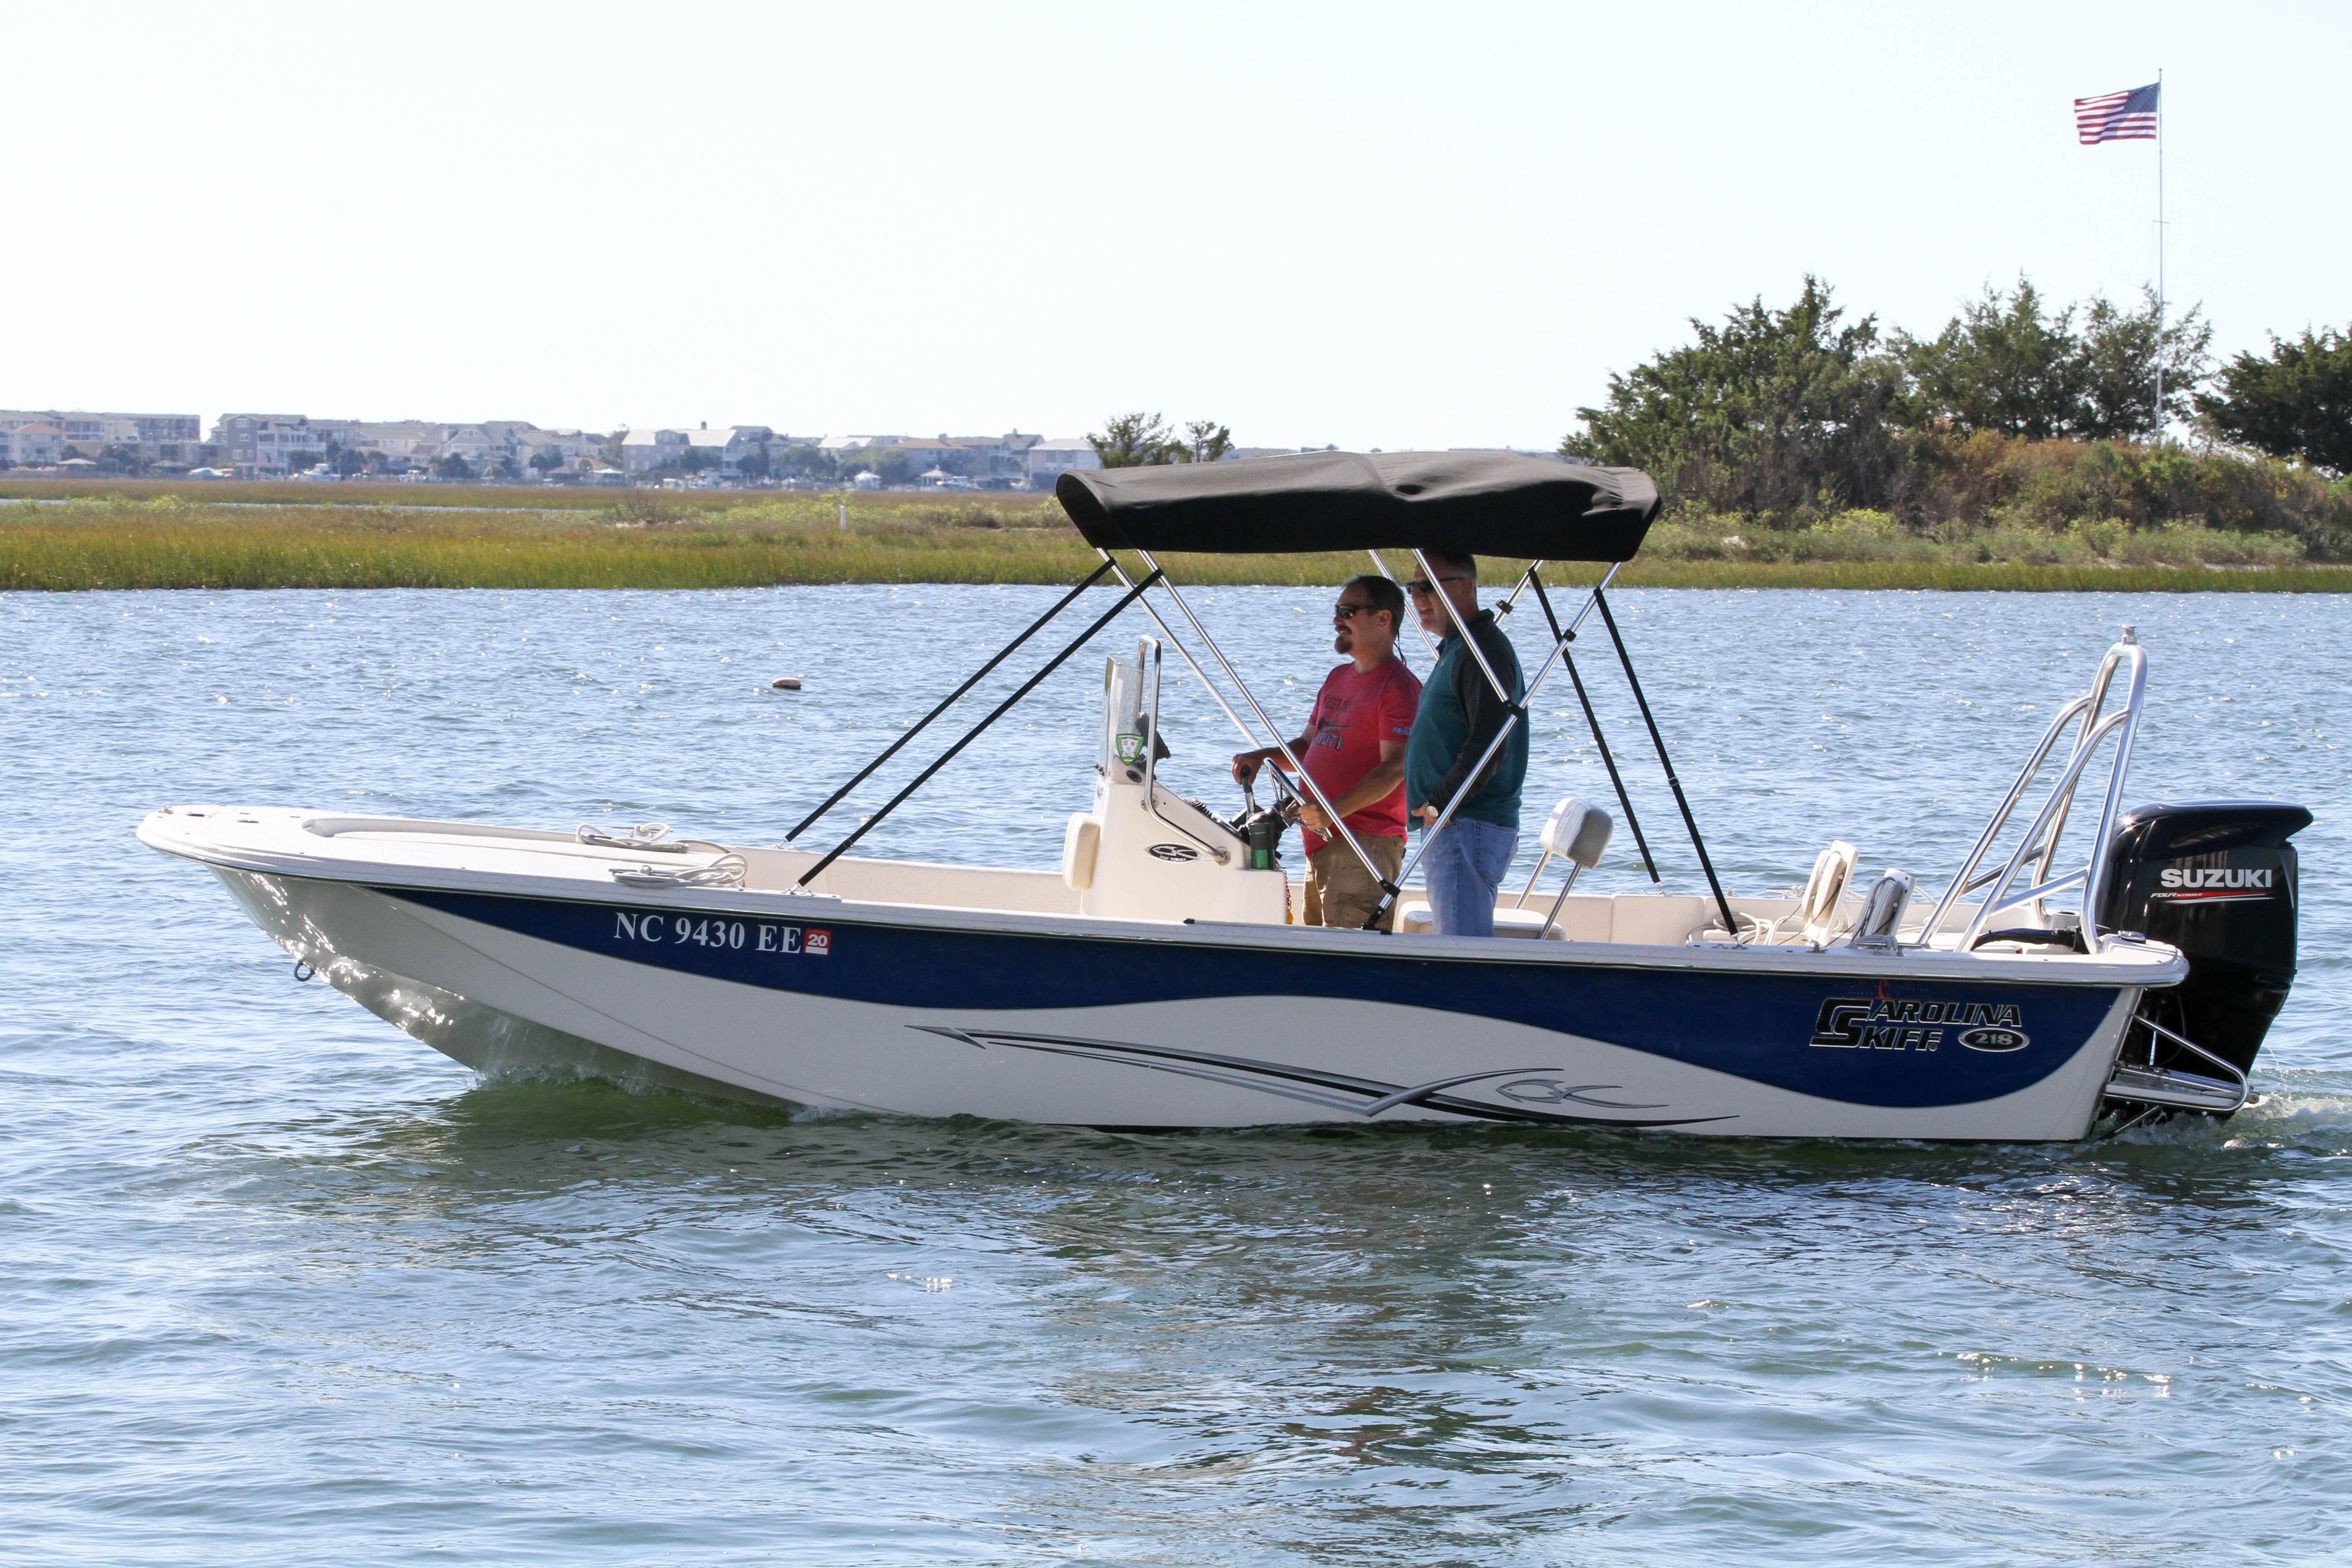 Carolina Skiff Boat Rentals Carolina Beach, NC | Water Sports